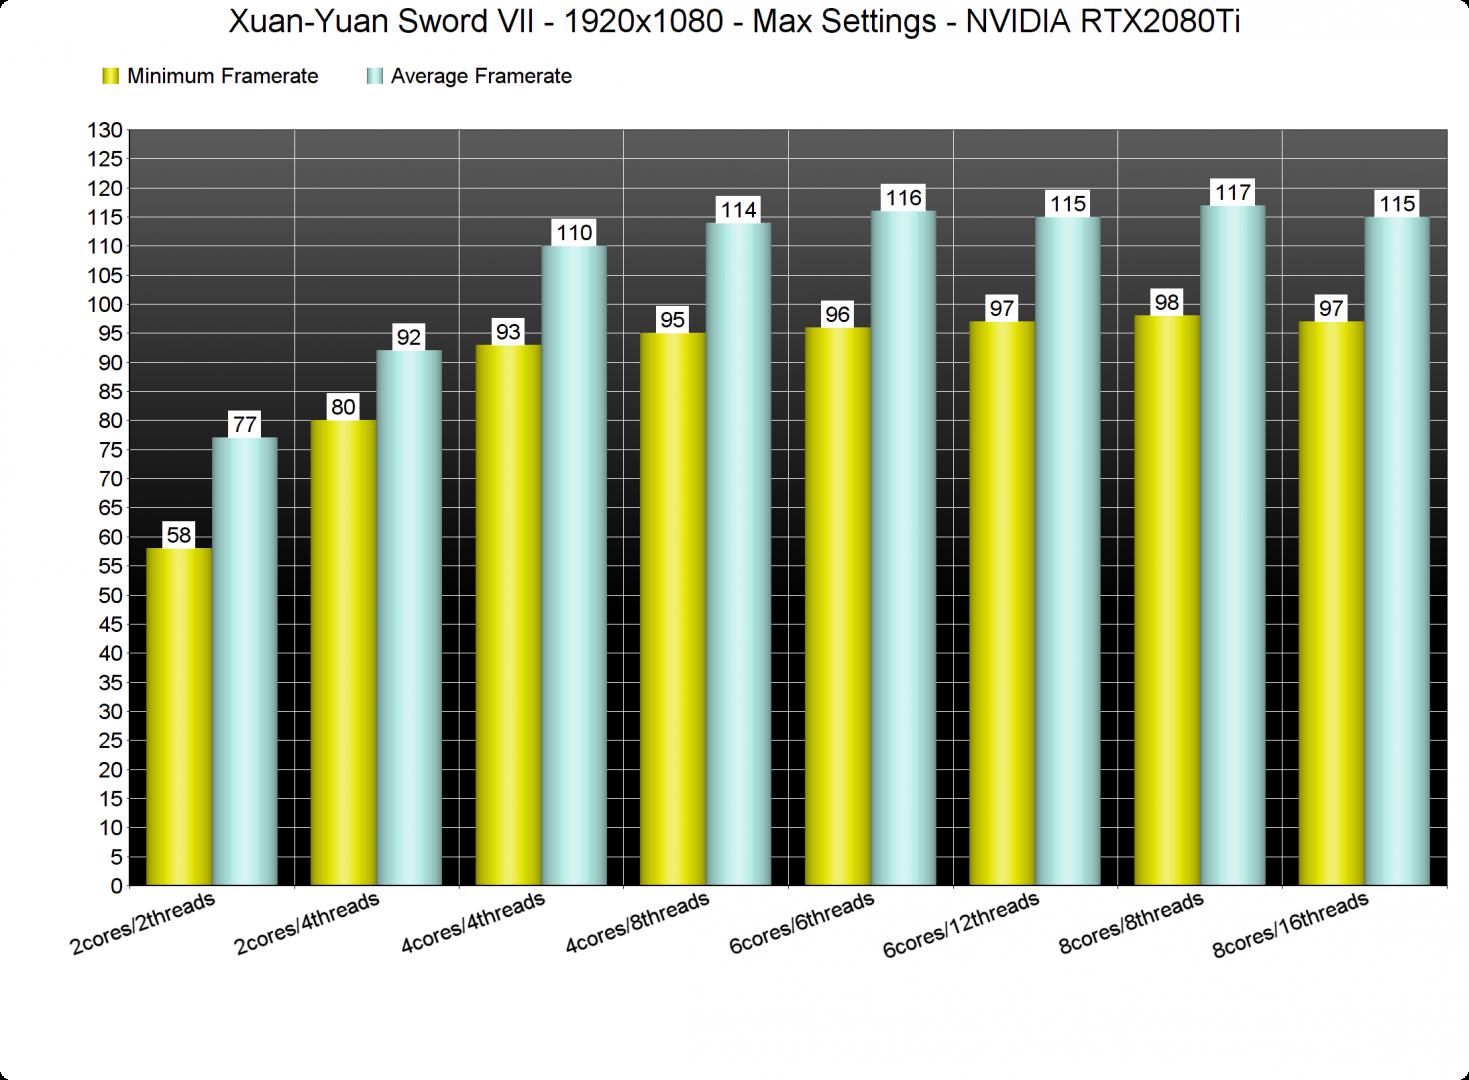 Xuan-Yuan Sword VII CPU benchmarks-1